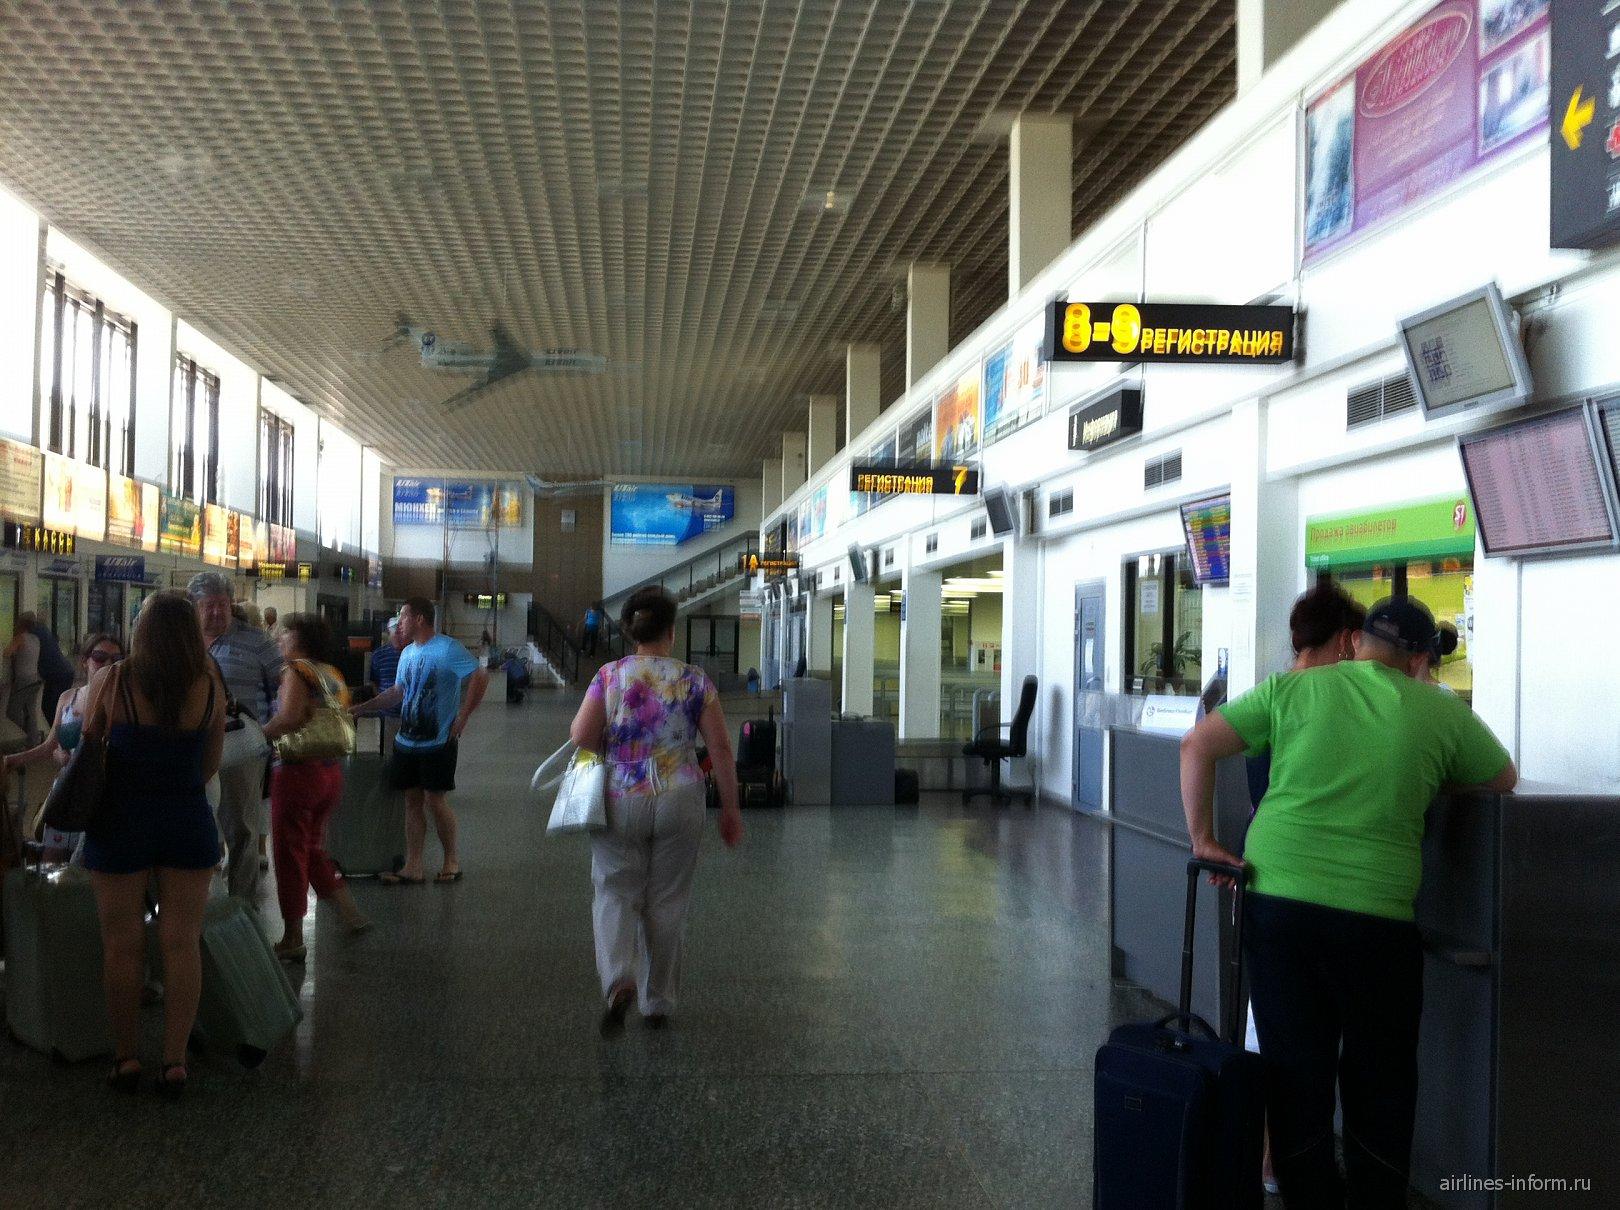 В аэропорту Тюмень Рощино